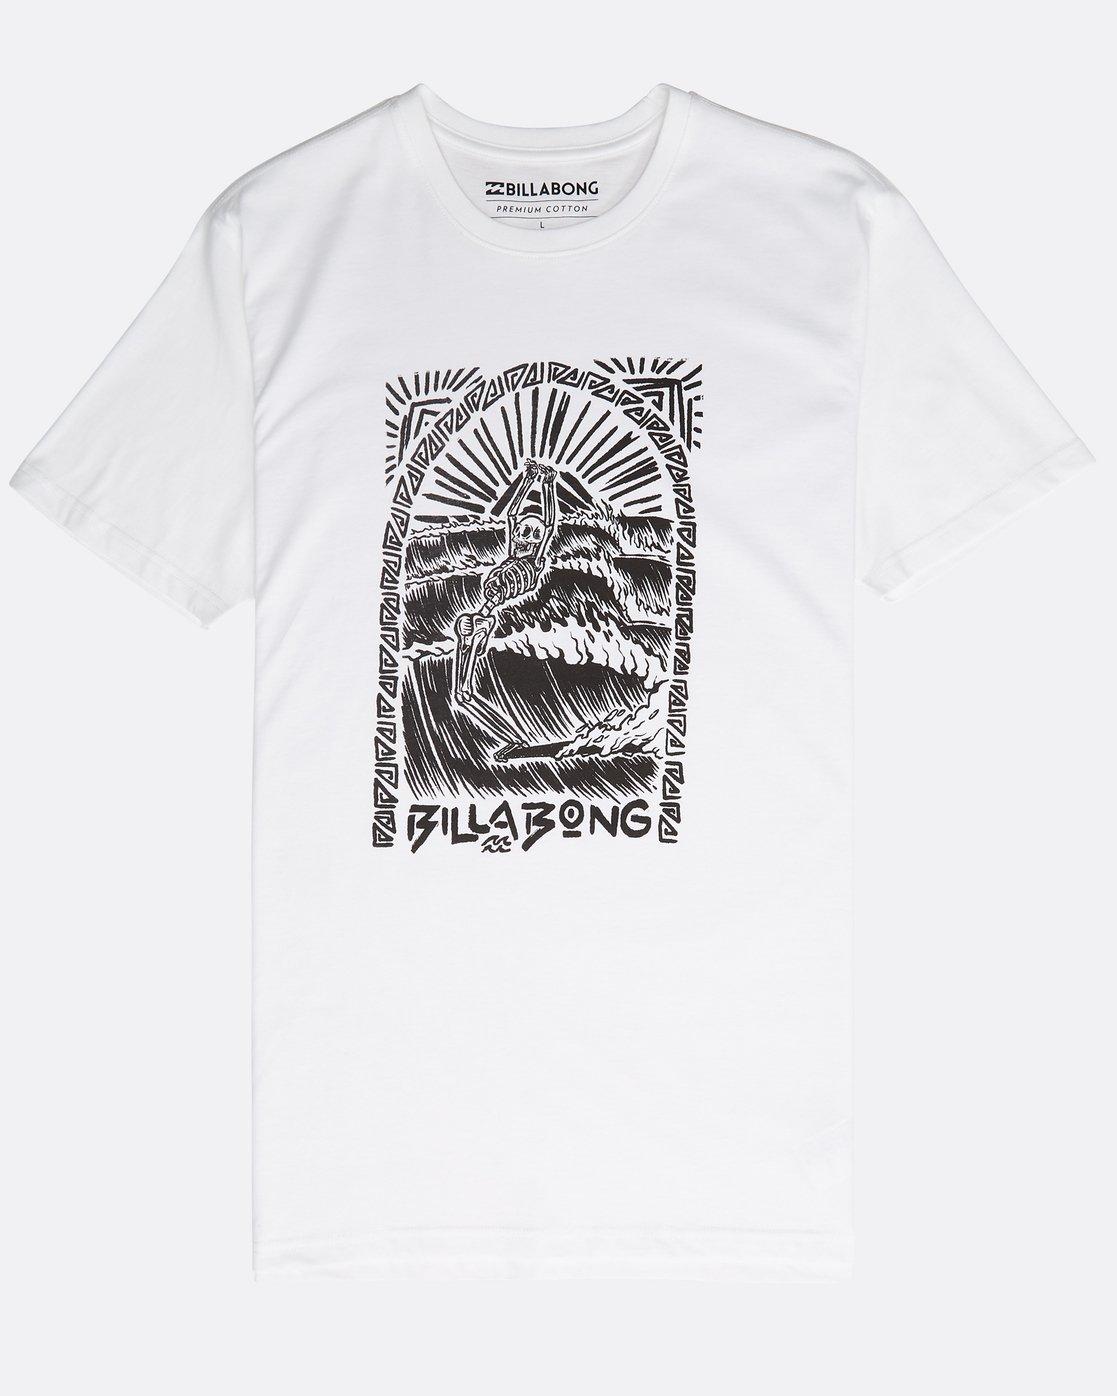 N1ss33bip9Billabong T Shirt Dead Walk Walk T Shirt Dead 5RjL34Aq